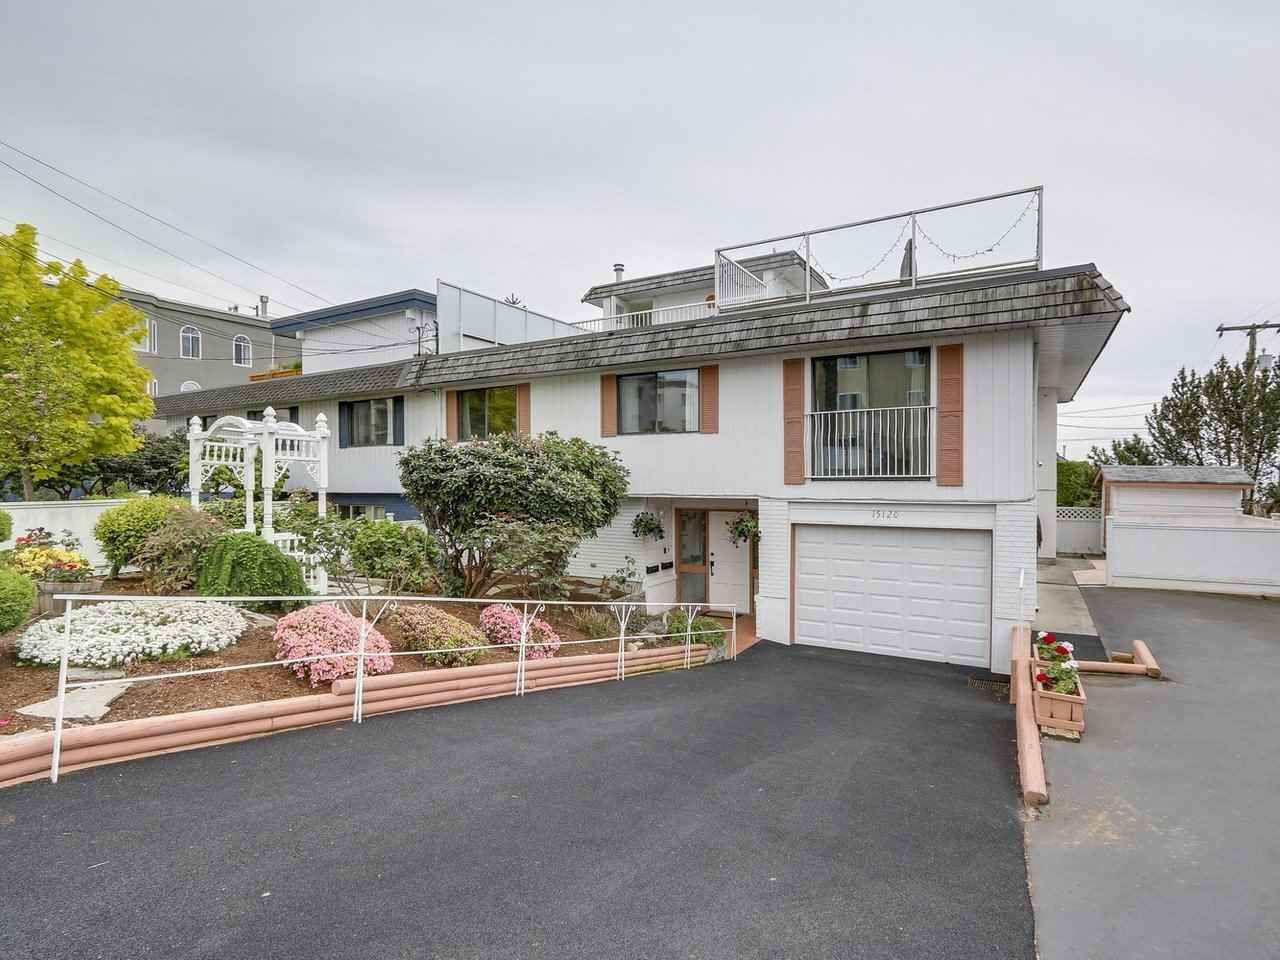 Main Photo: 15120 PROSPECT AVENUE: White Rock 1/2 Duplex for sale (South Surrey White Rock)  : MLS®# R2165190